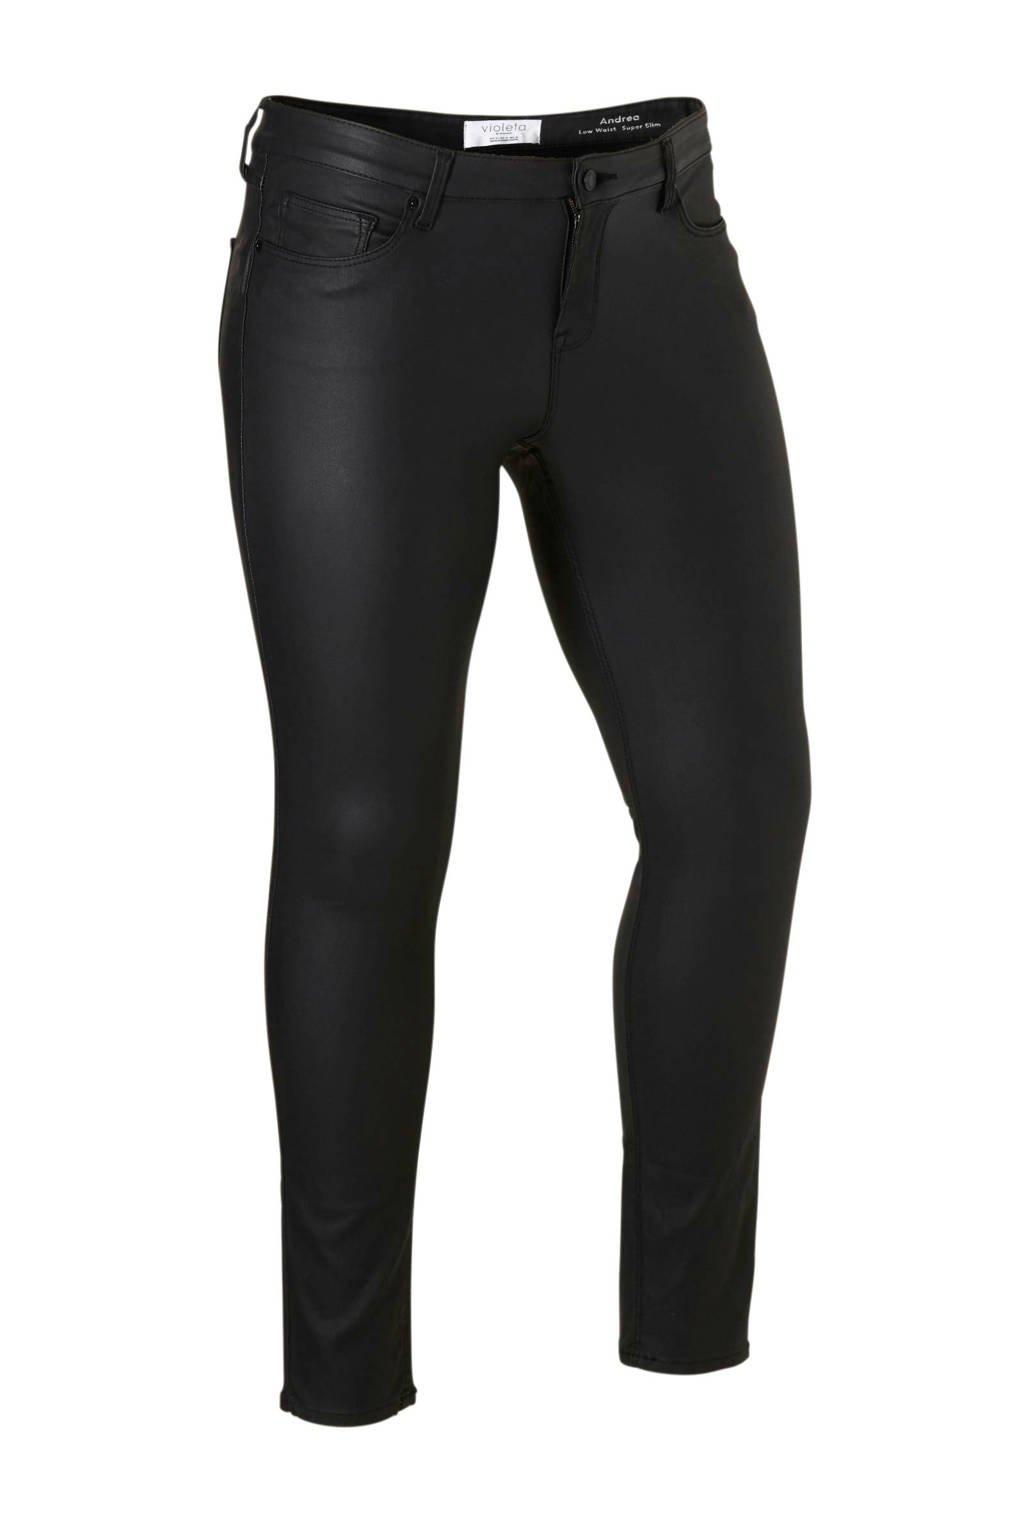 Violeta by Mango coated low waist slim fit broek zwart, Zwart